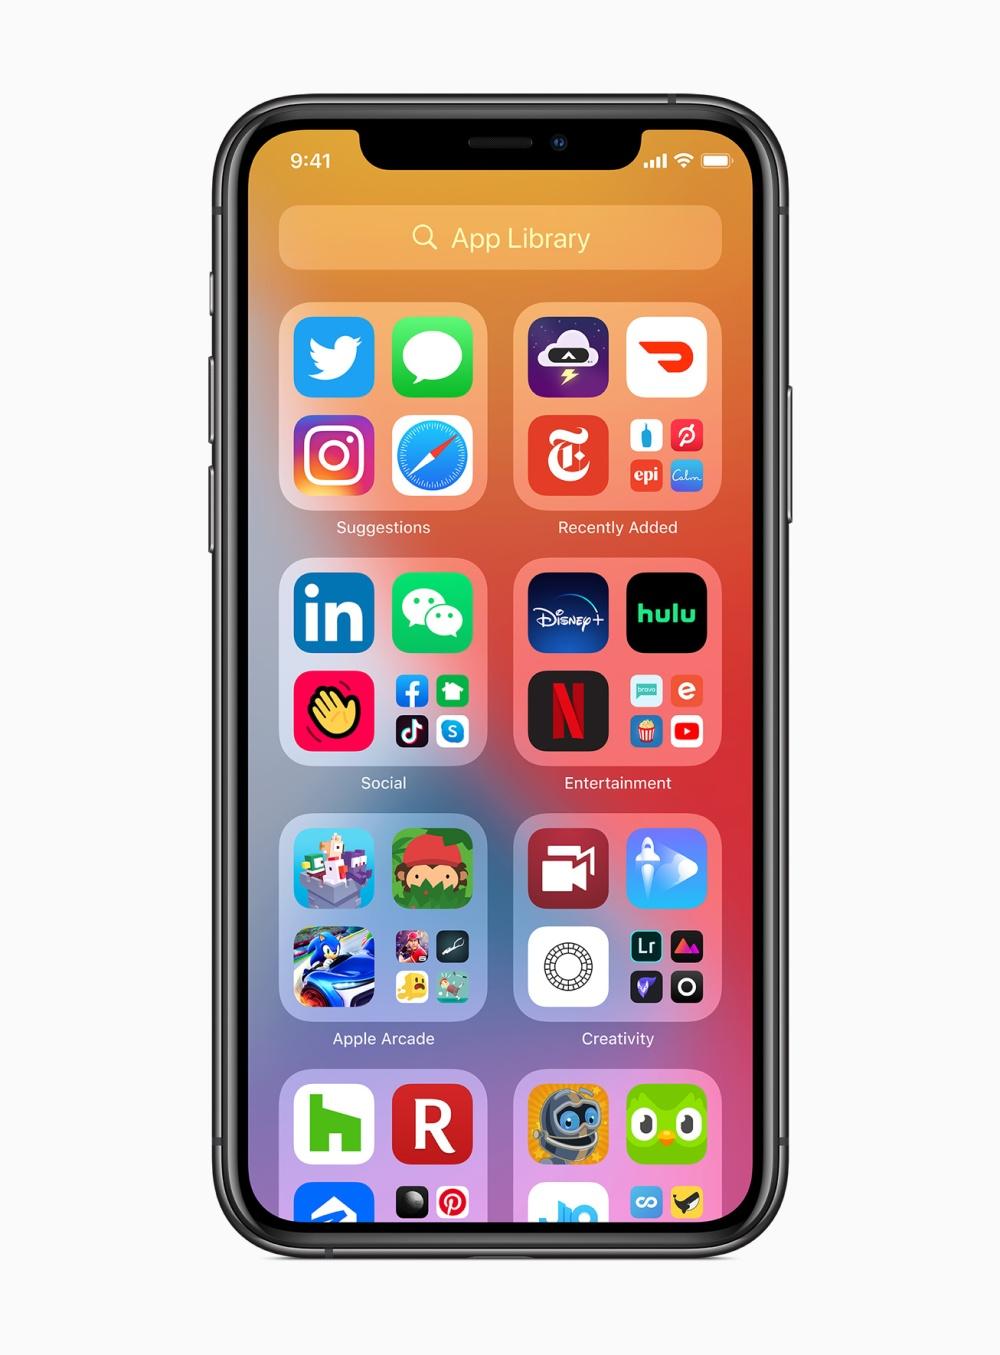 apple_ios14-app-library-screen_06222020